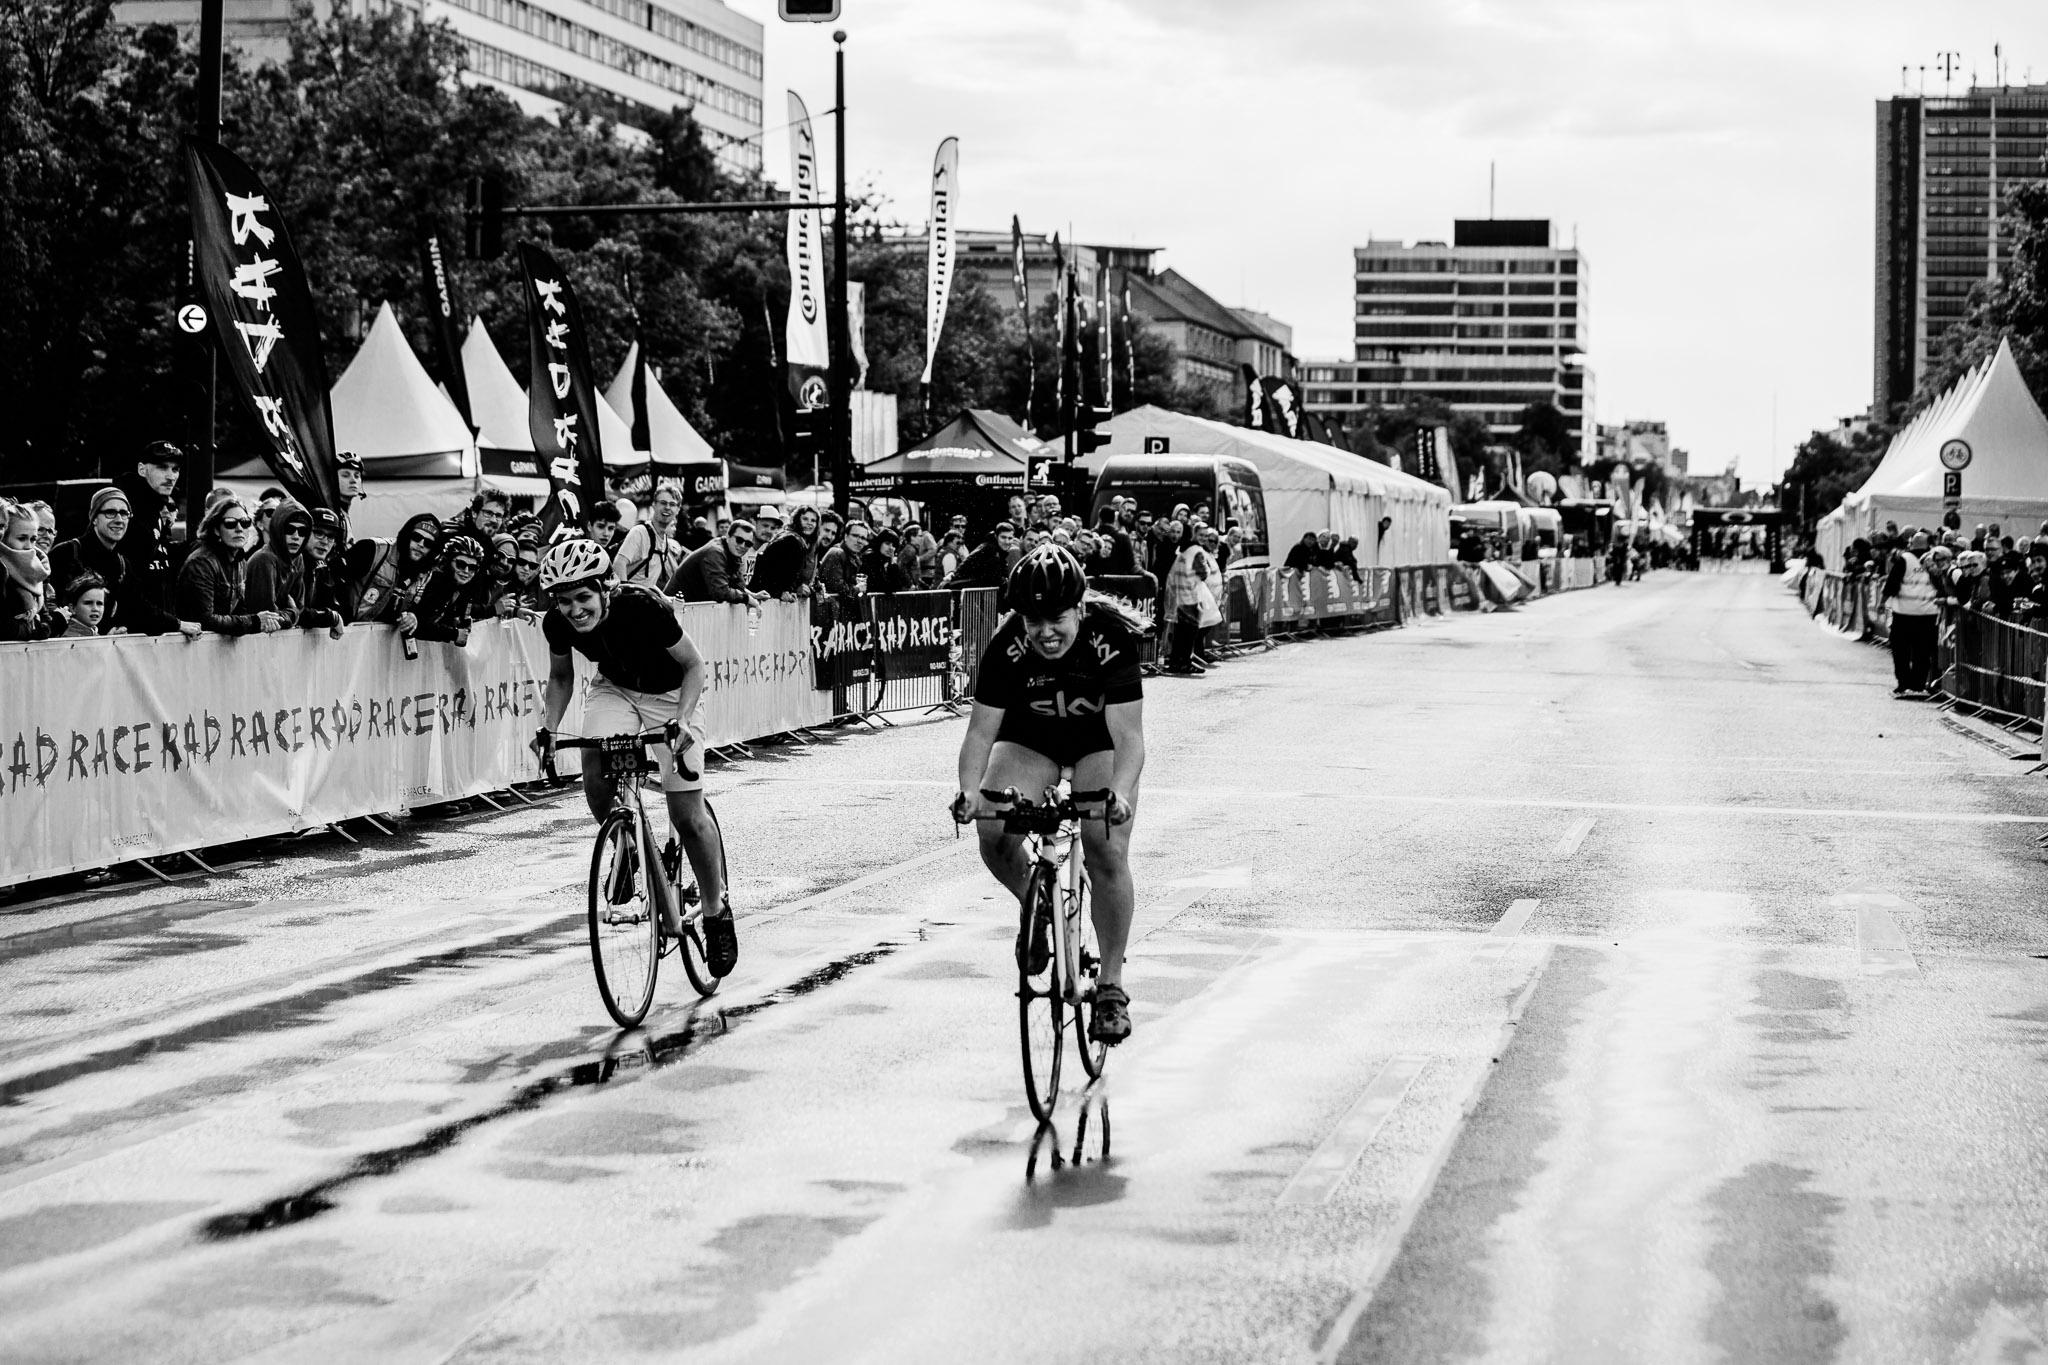 RAD RACE Battle, Berlin May 30 2015 Photo by Björn Lexius_12.jpg